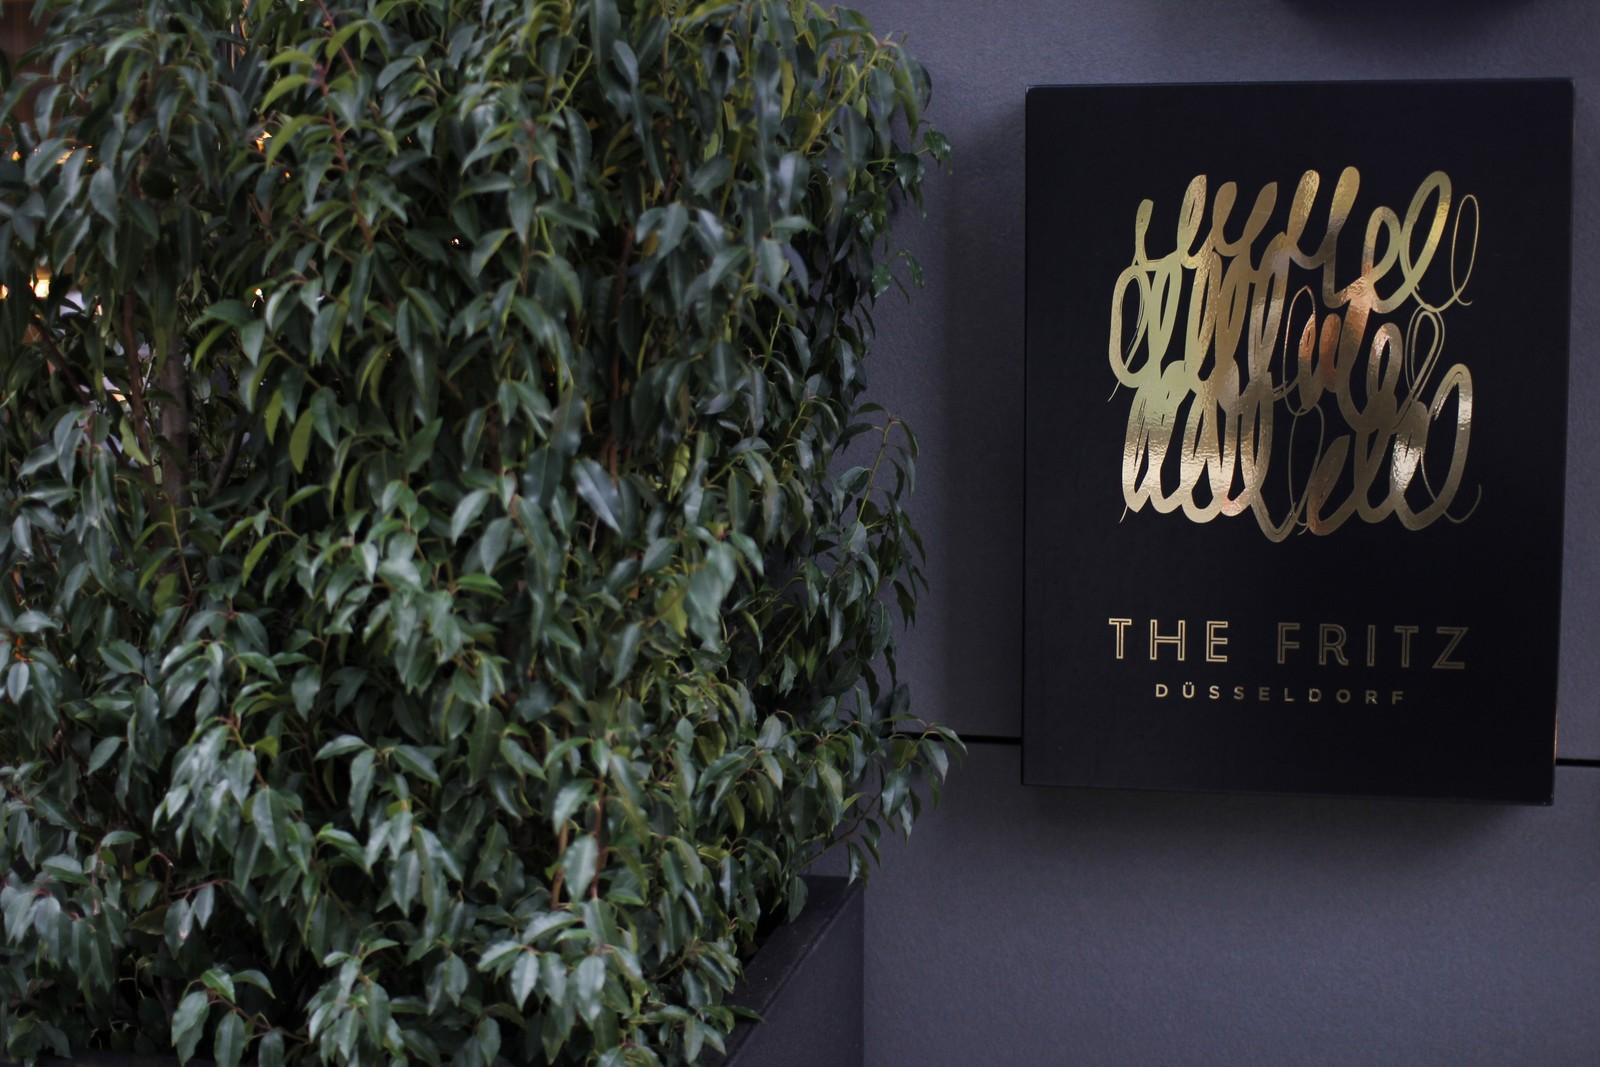 The Fritz Hotel Duesseldorf!